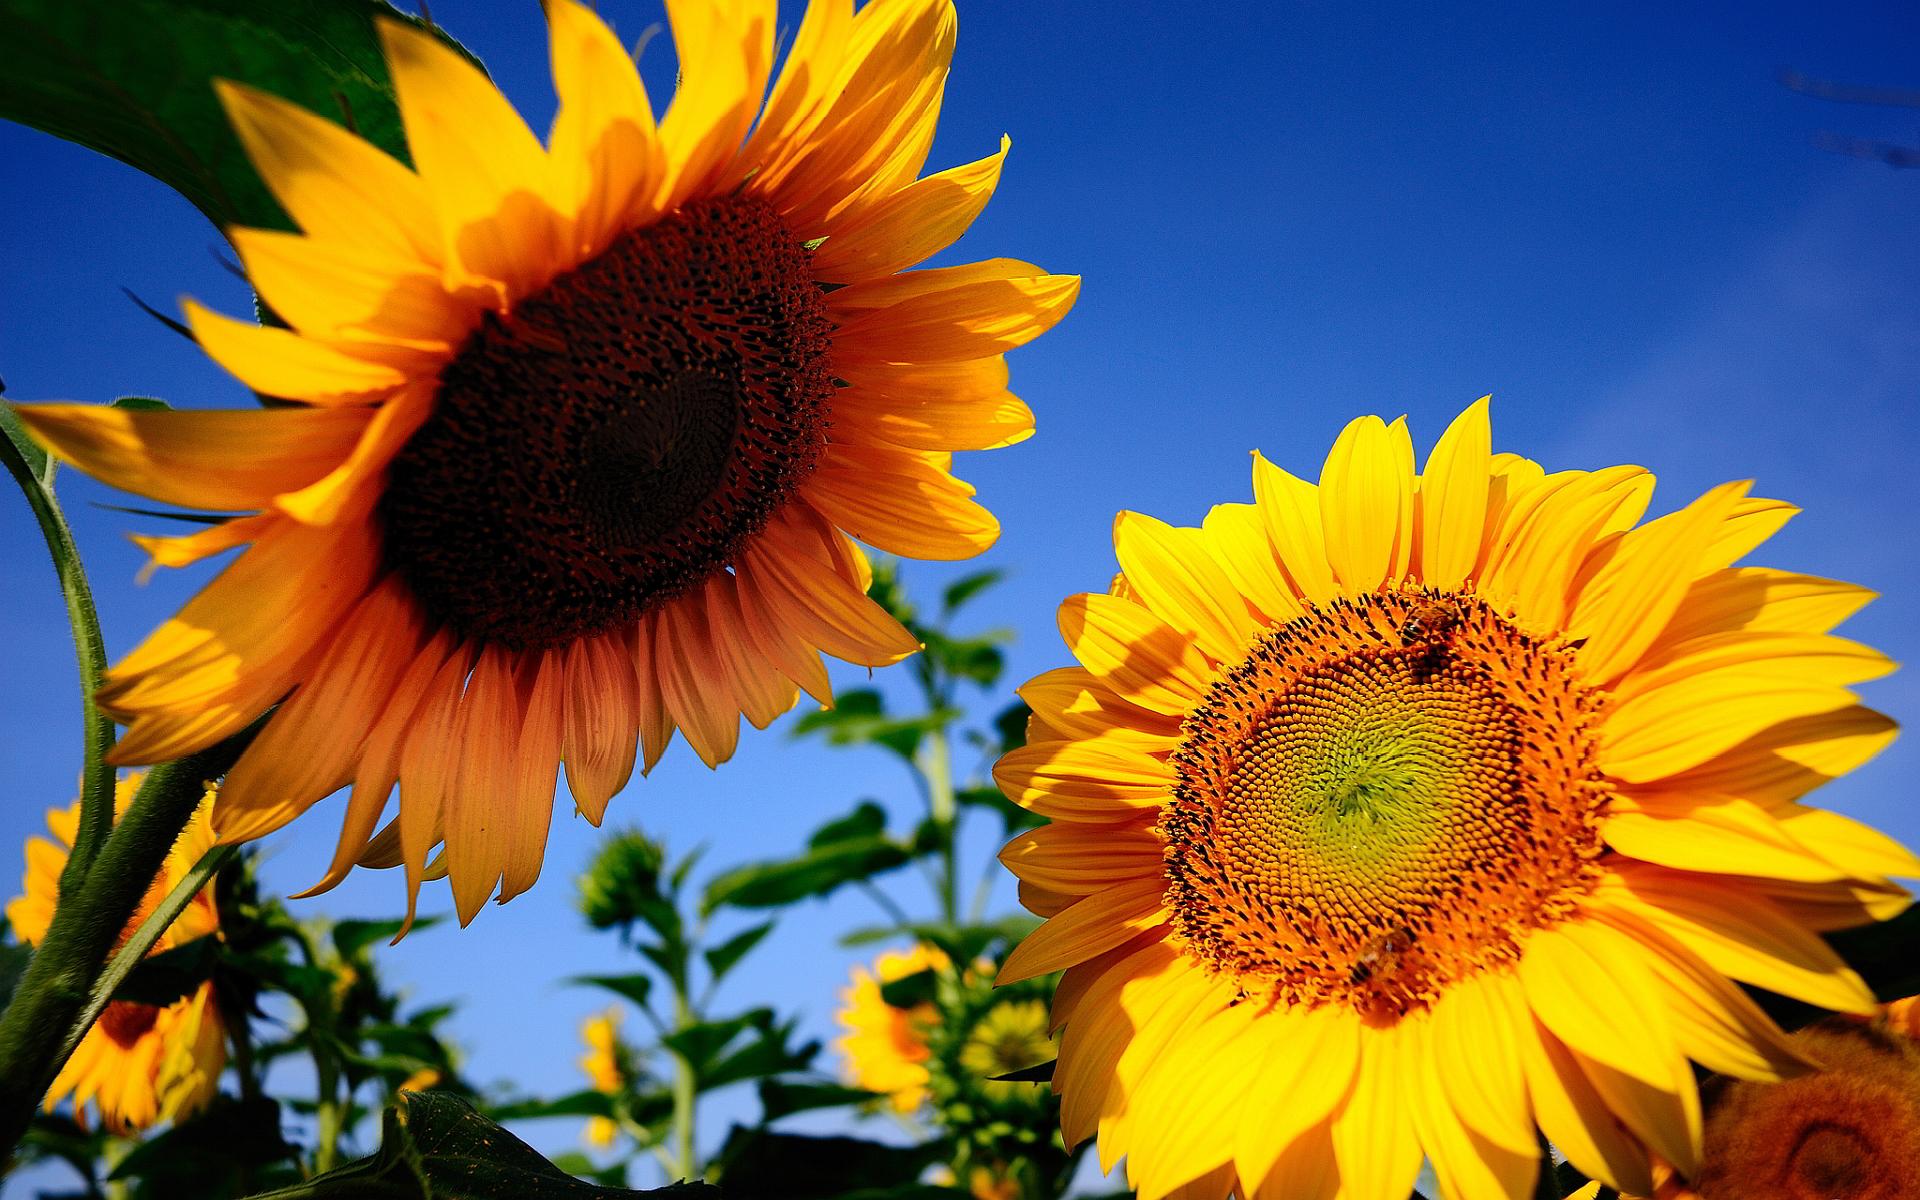 Two sunflowers talking in the sun - Summer season